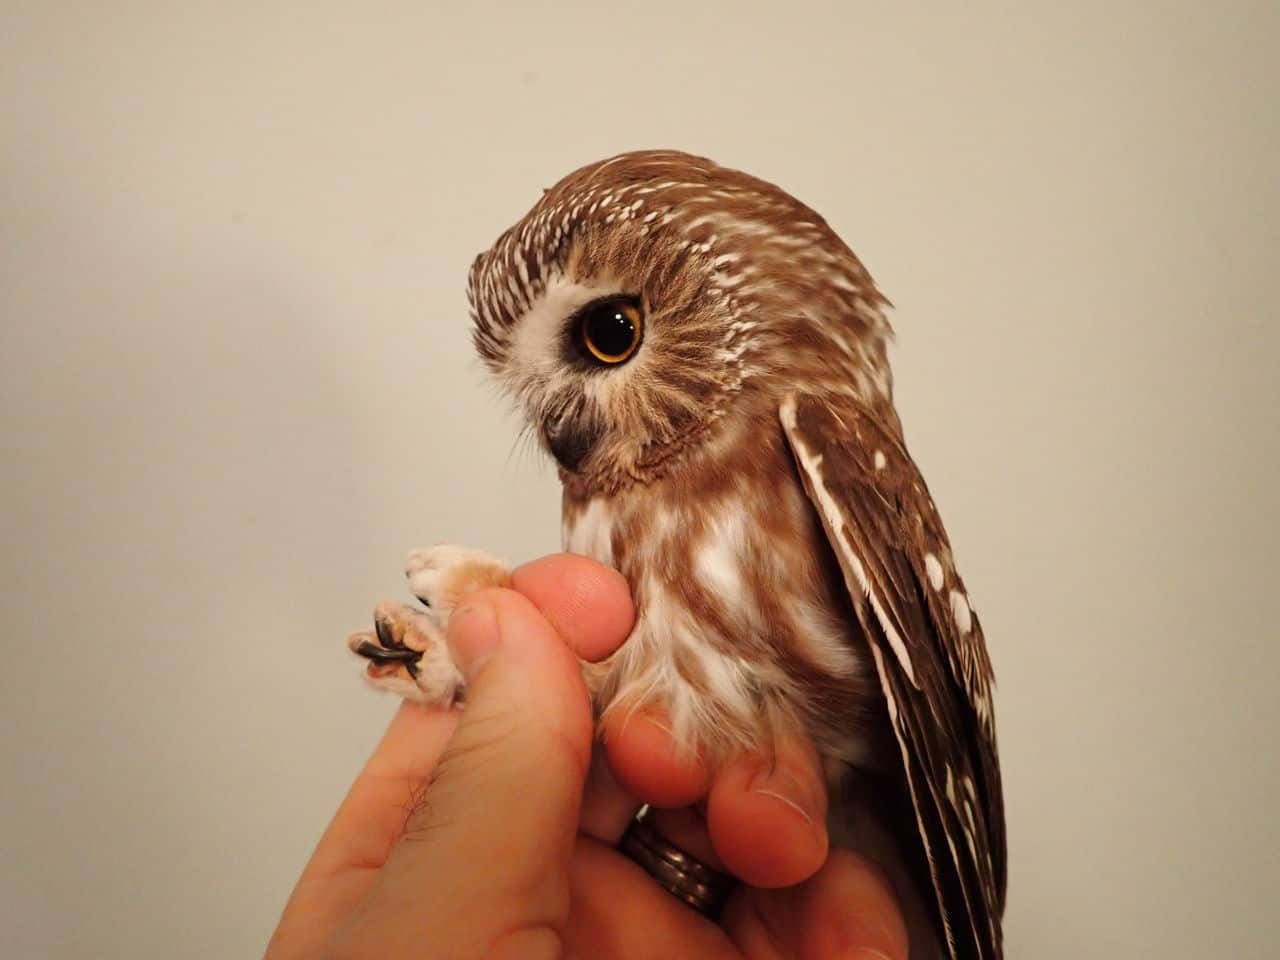 Nov 2020 - Northern Saw-whet Owl